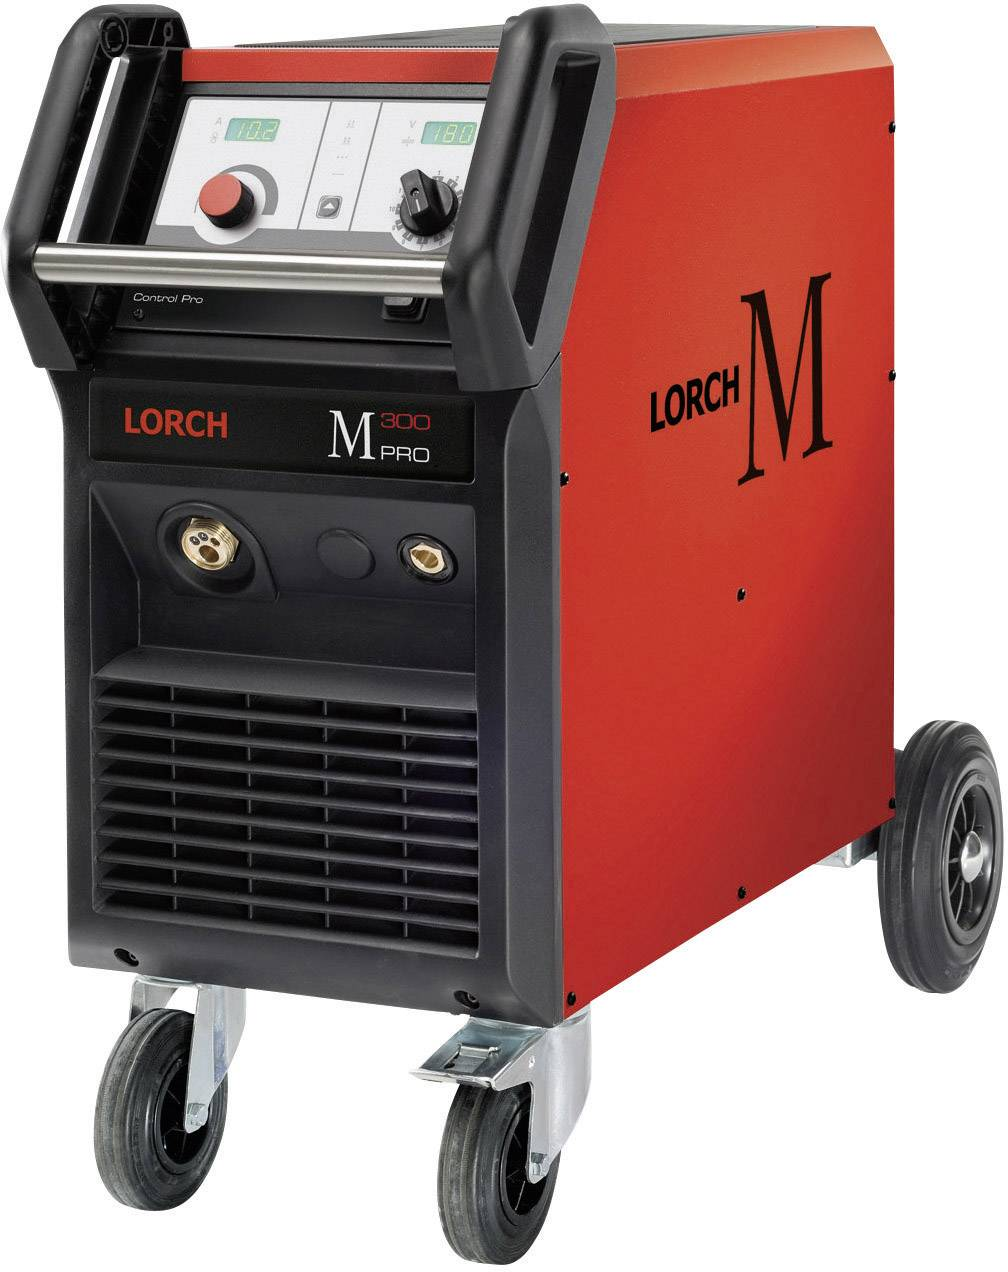 MIG / MAG svářečka Lorch 218.0301.3, 30 - 300 A, s hořákem